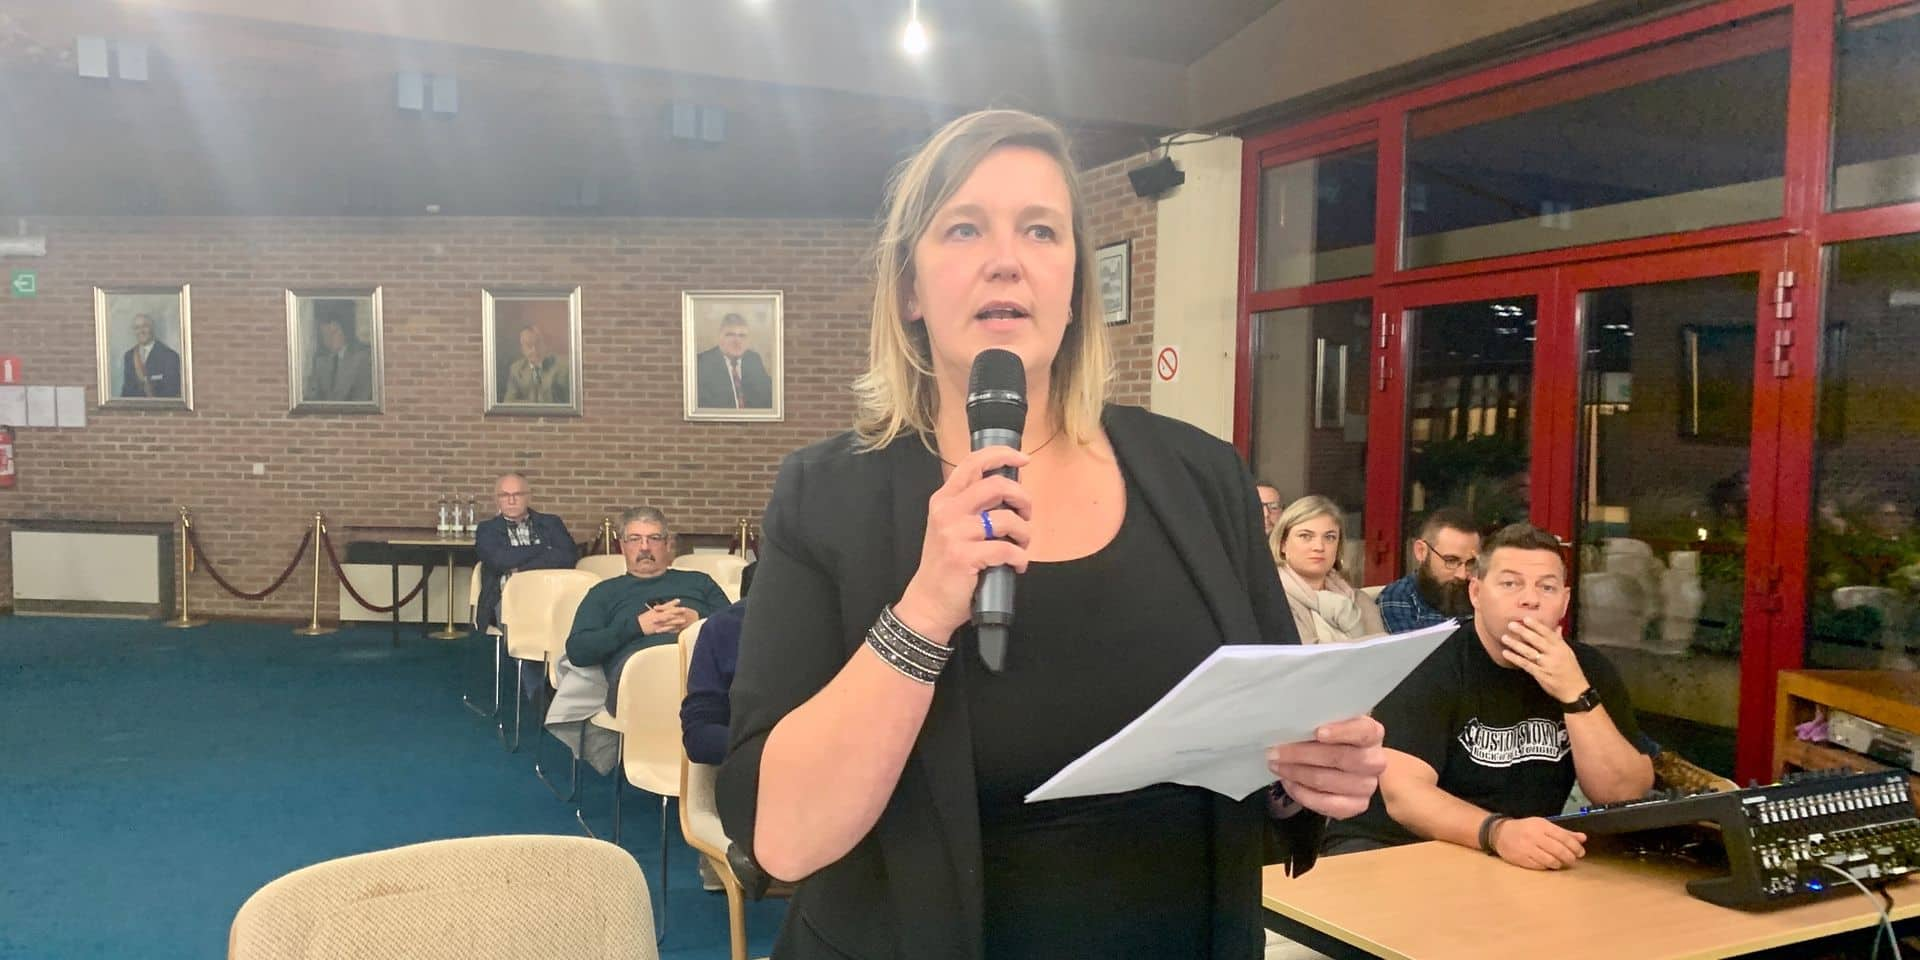 Interpellation citoyenne au conseil communal de Sambreville